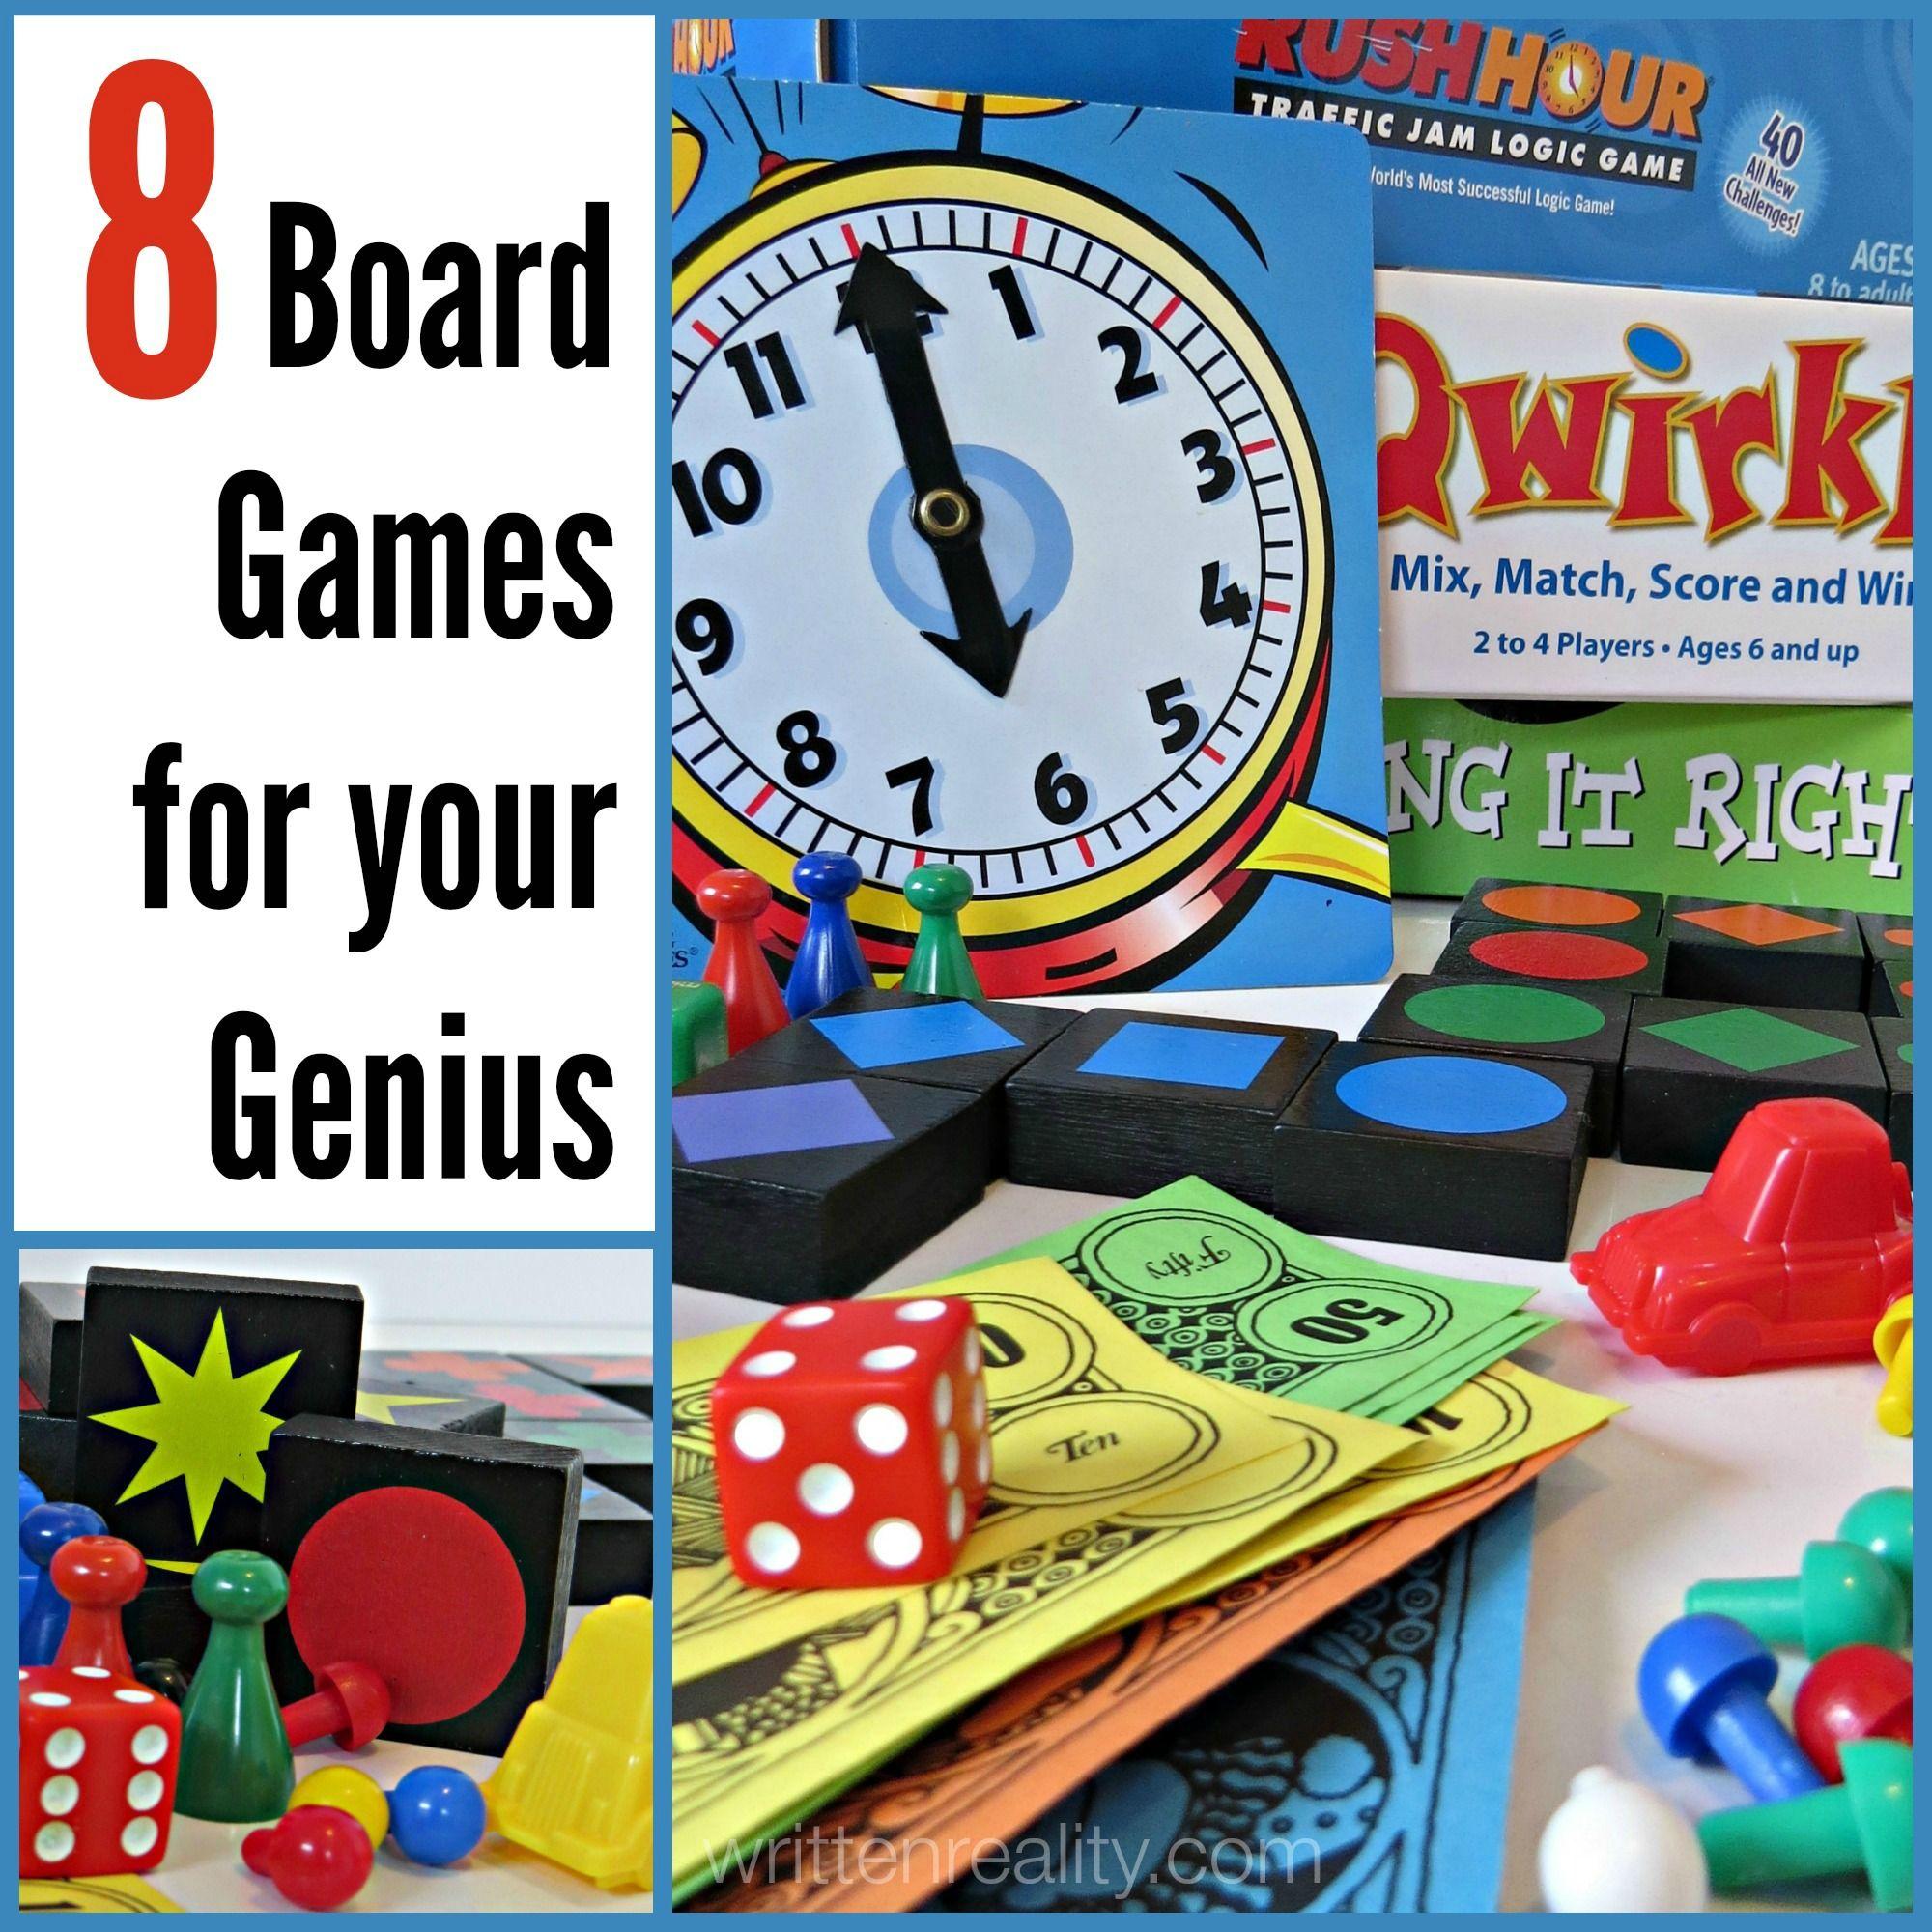 8 Board Games for Your Genius Board games, Board games